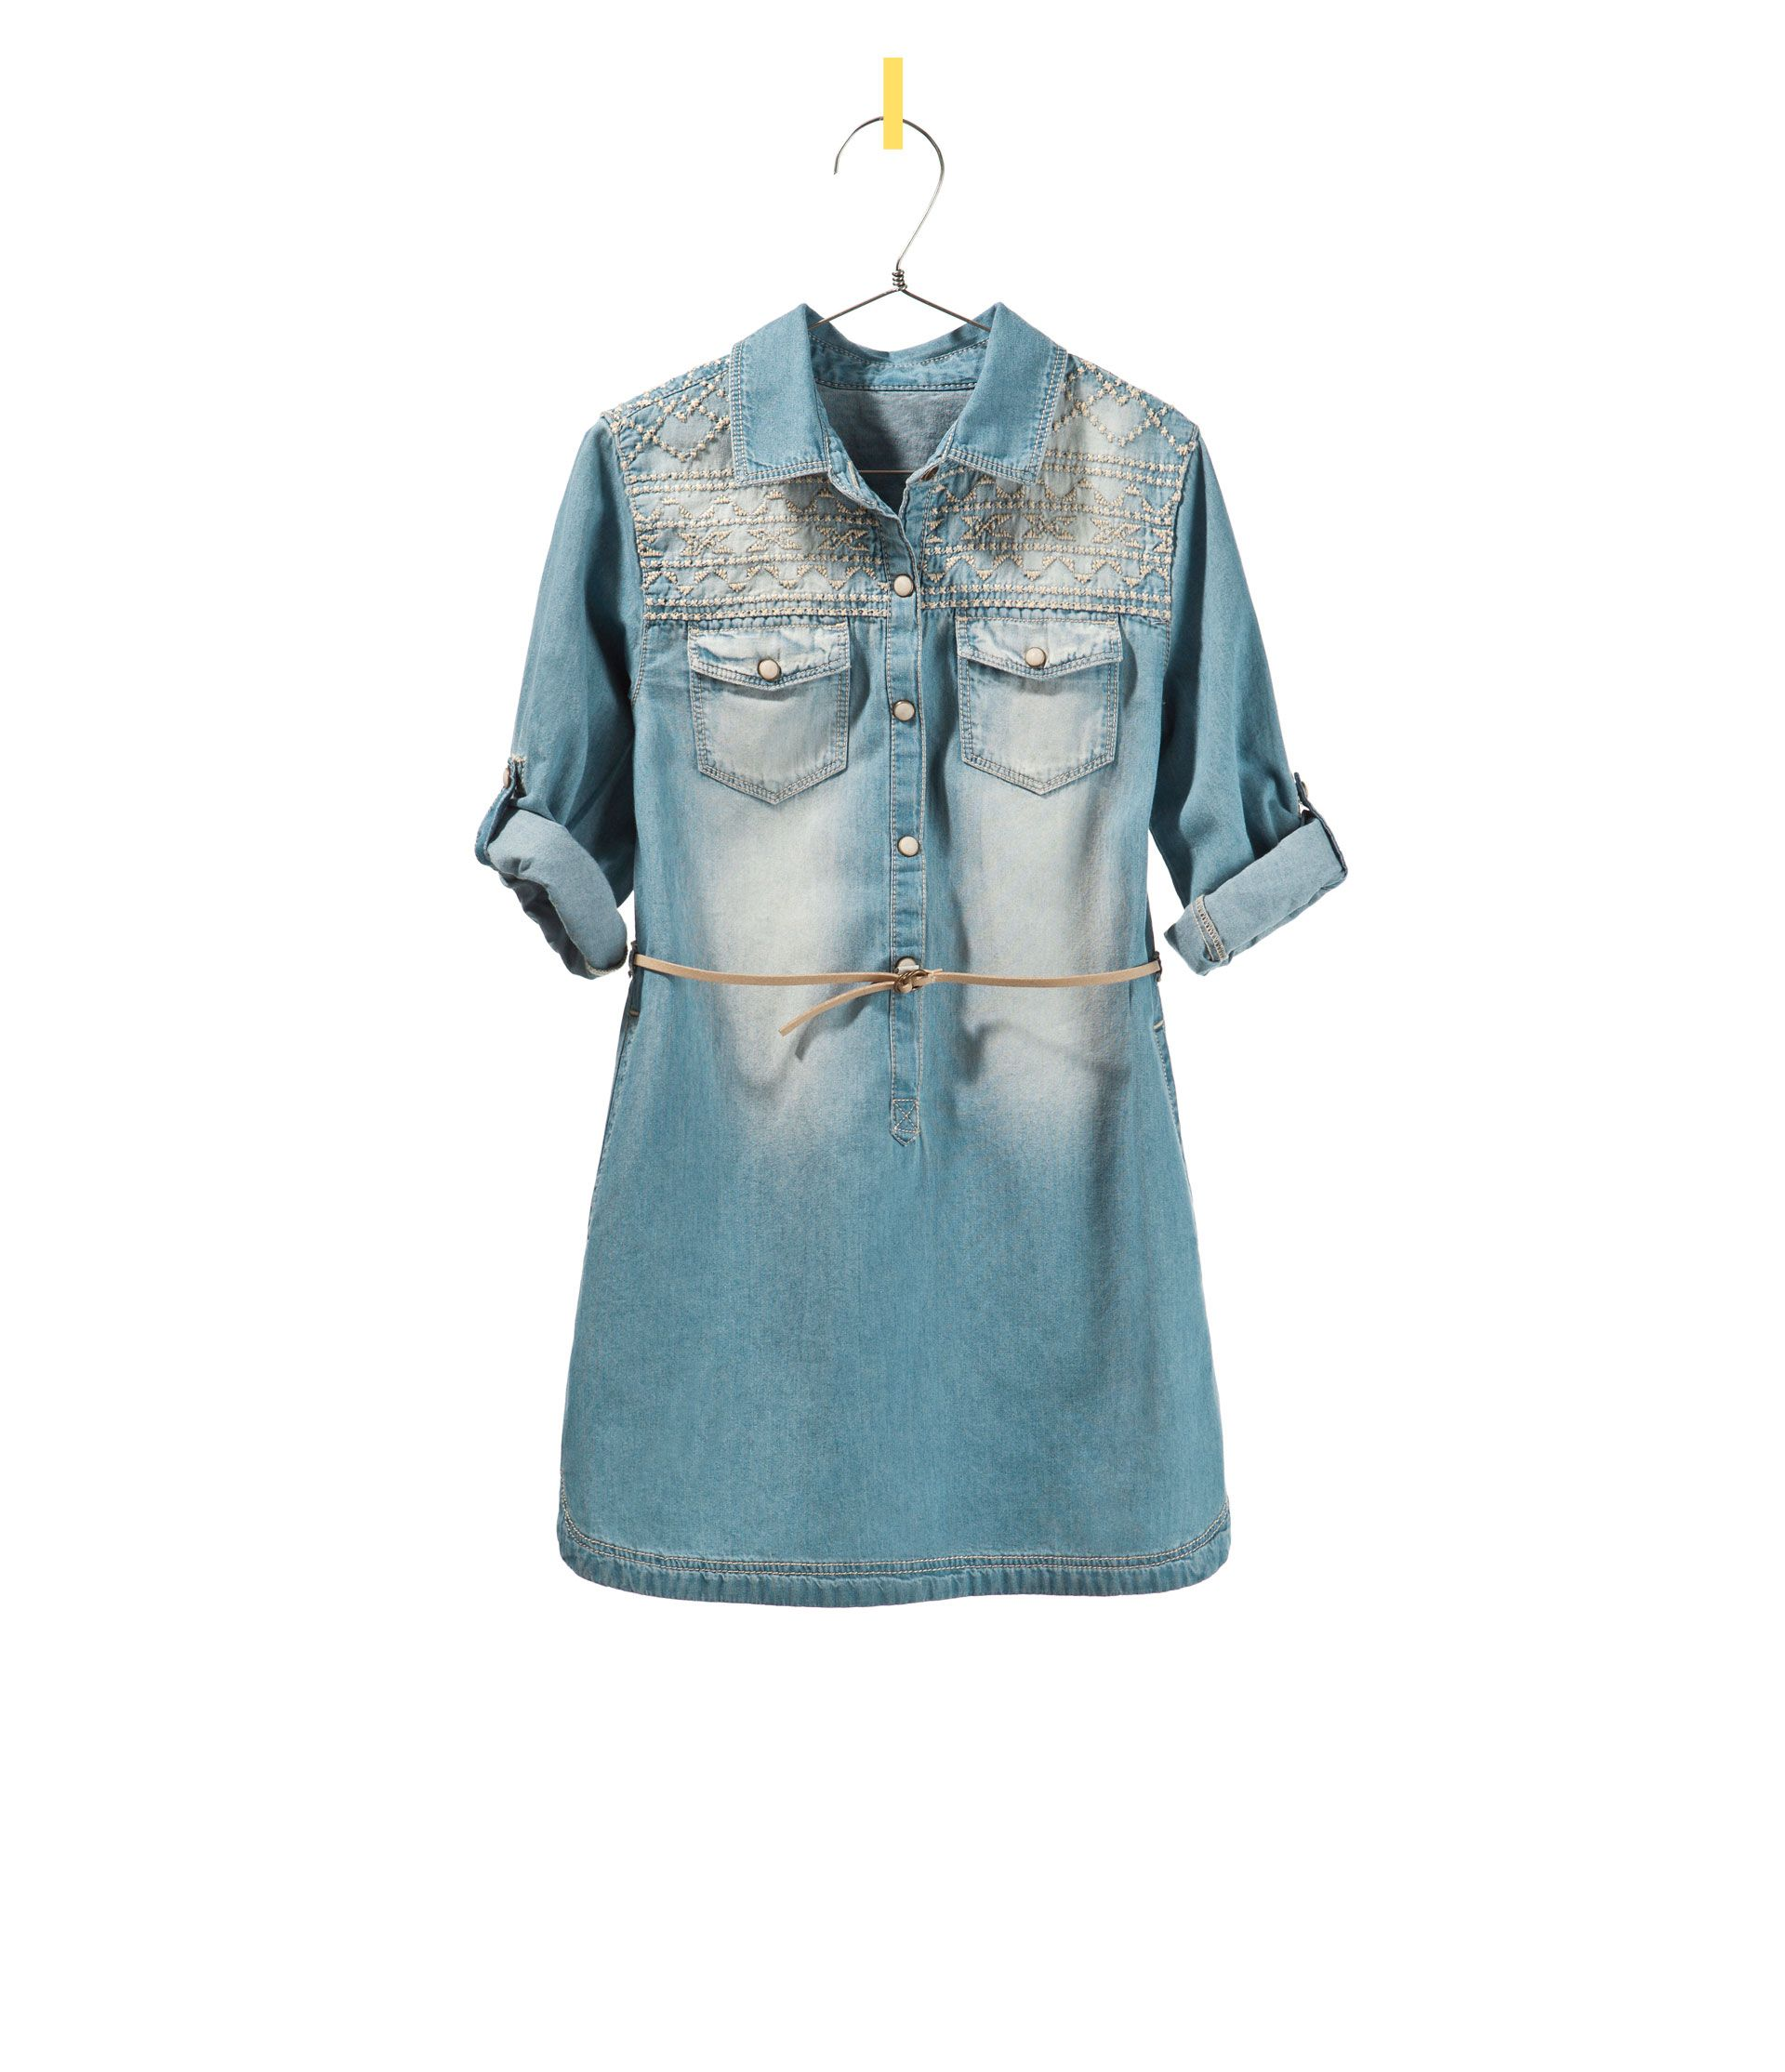 Robe De Chambre Fille Zara : Robe de fille zara broderie florale multicolore robes